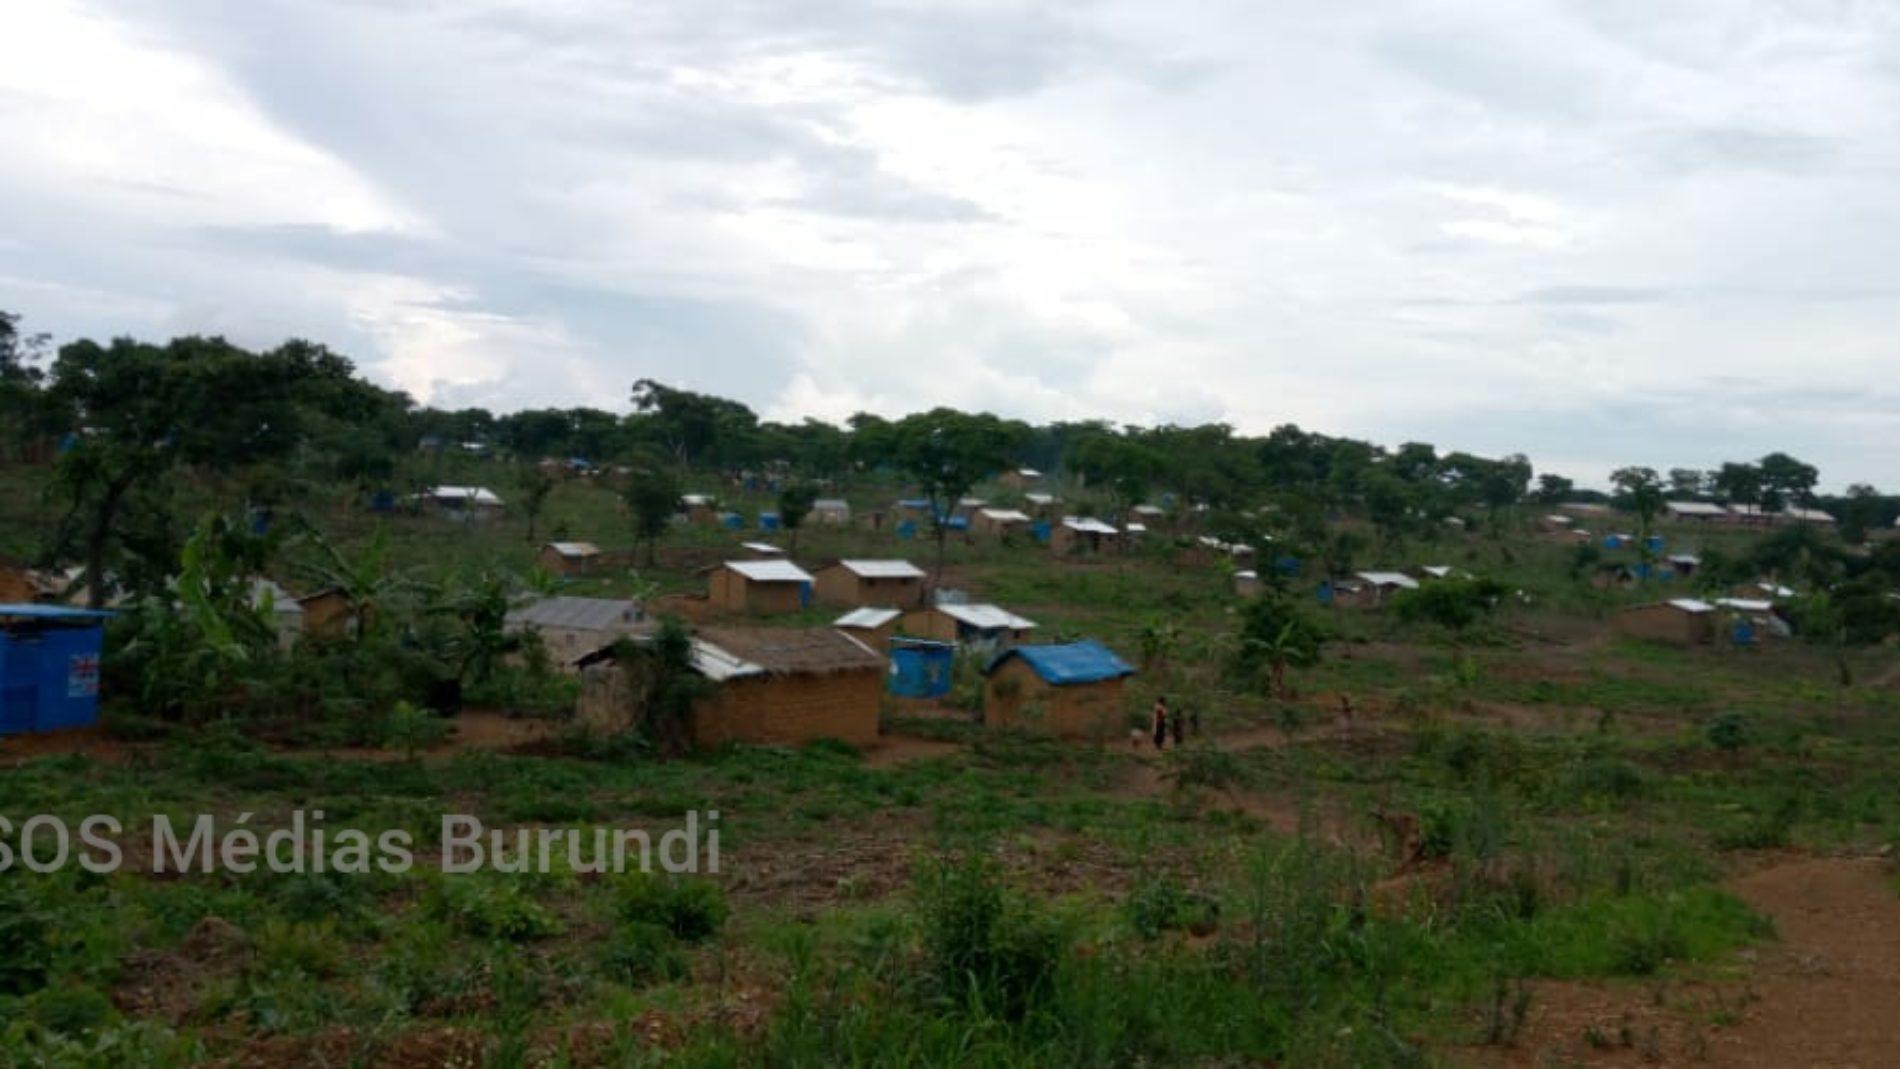 Nyarugusu (Tanzanie) : l'administration du camp veut imposer un black-out